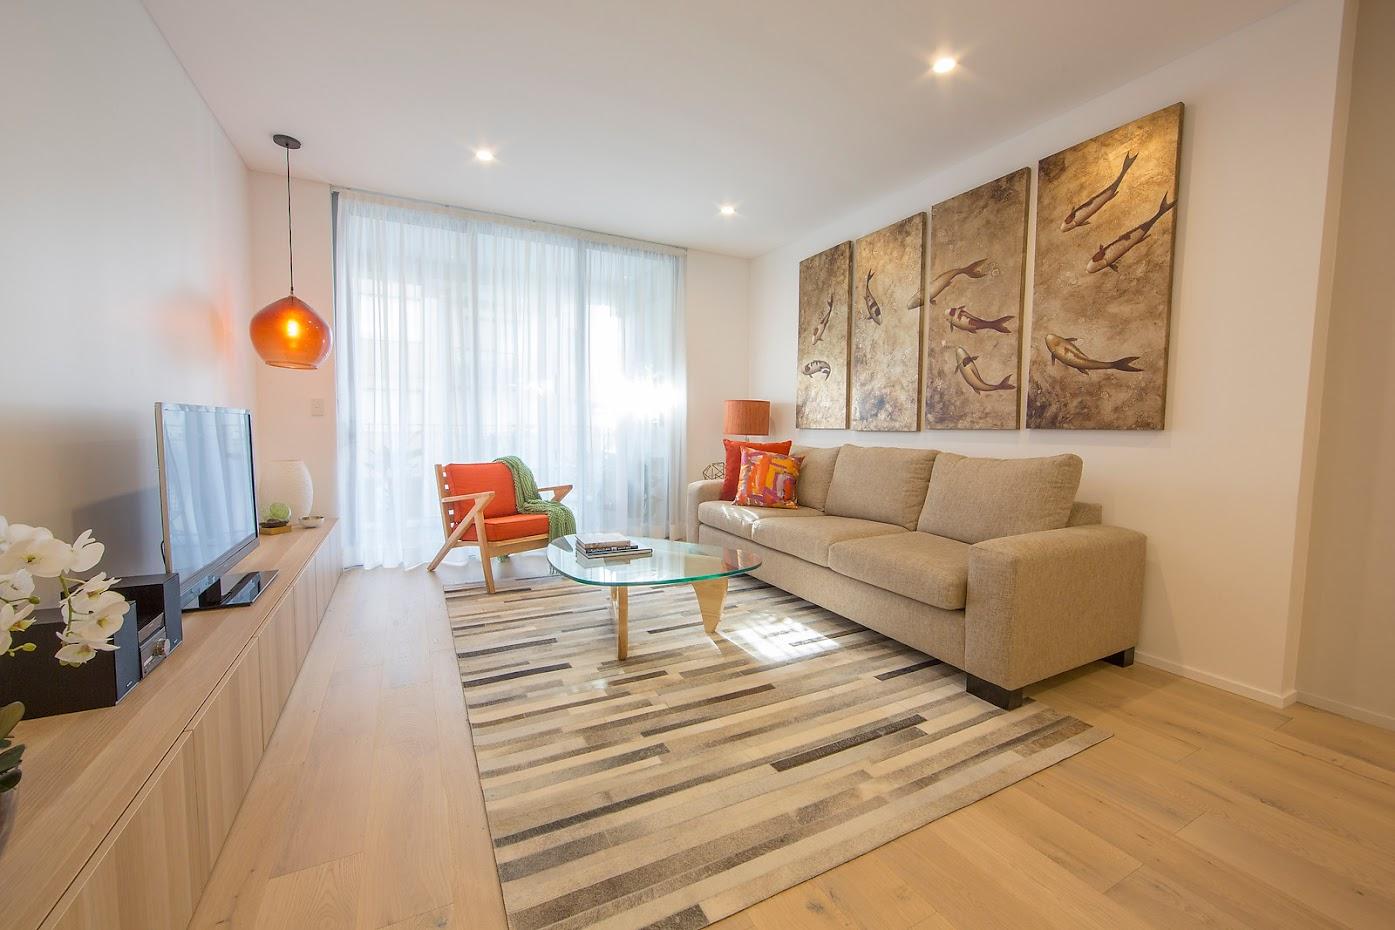 Ktirio.online | Διαχείριση Ακινήτων, Υπηρεσίες Βραχυχρόνιας Μίσθωσης Airbnb, Real Estate - Ακίνητα προς Πώληση & Ενοικίαση